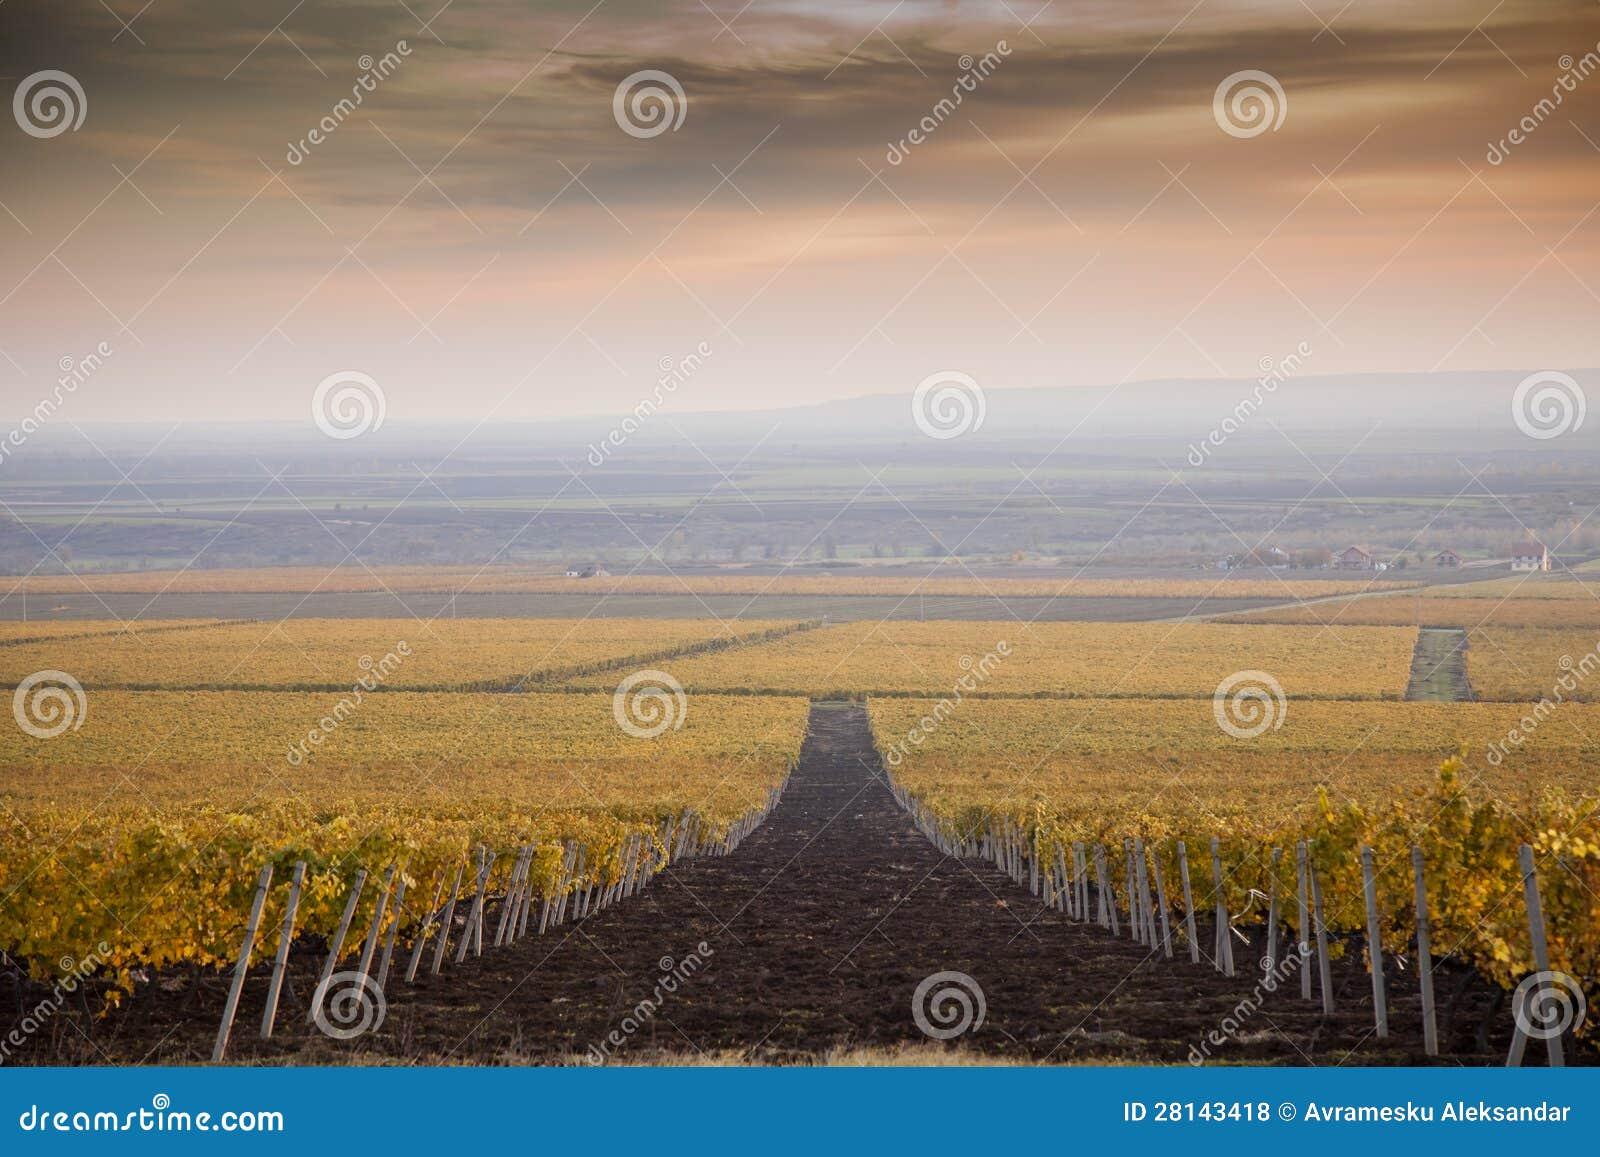 Vineyards in the autumn